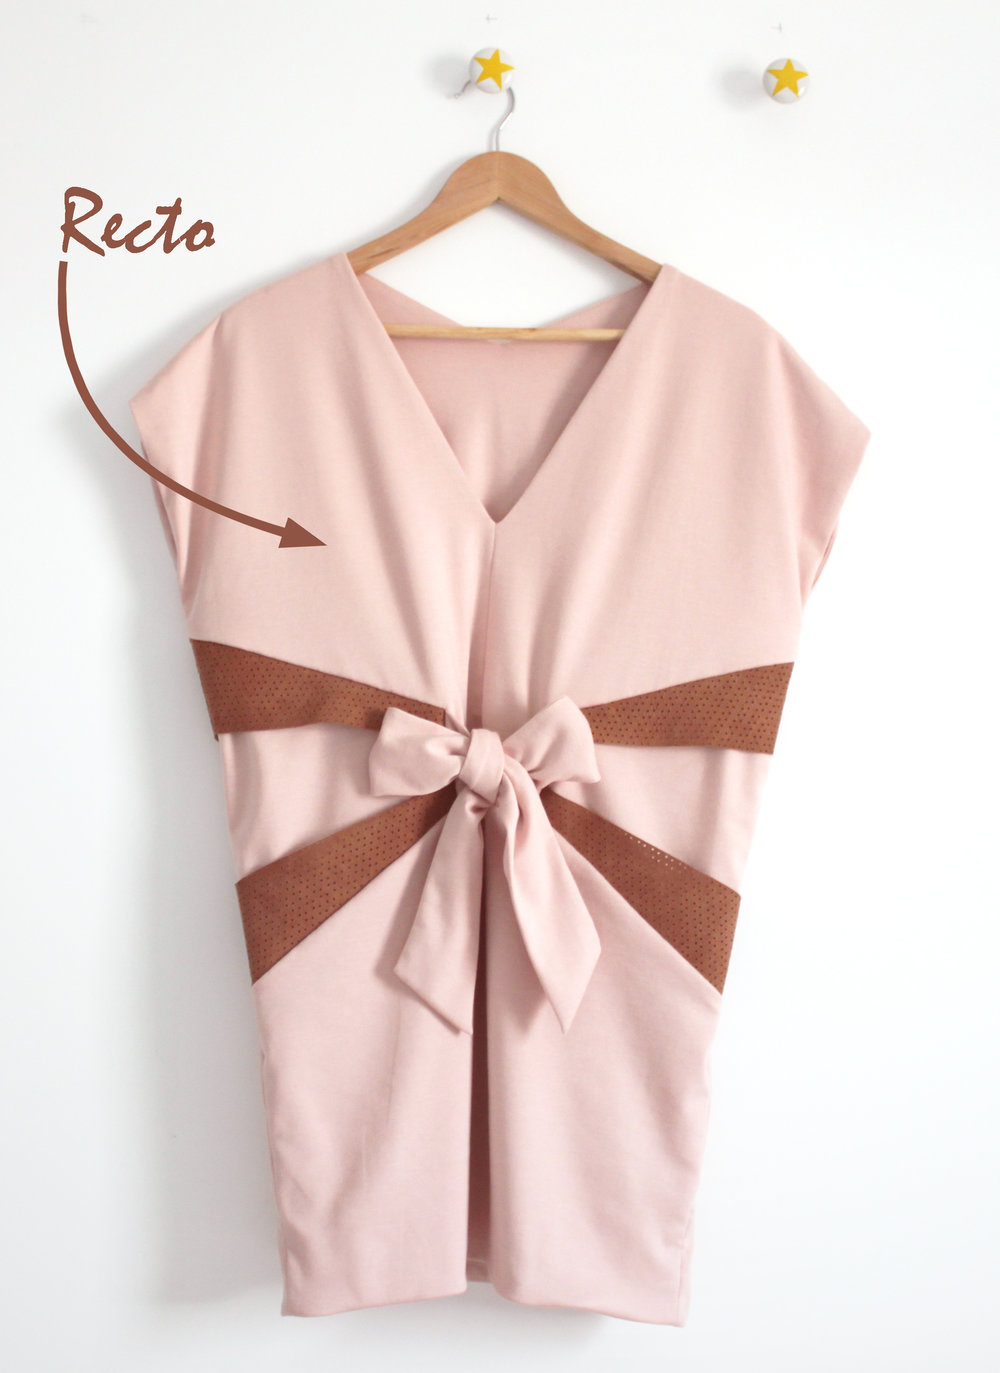 recto robe.jpg